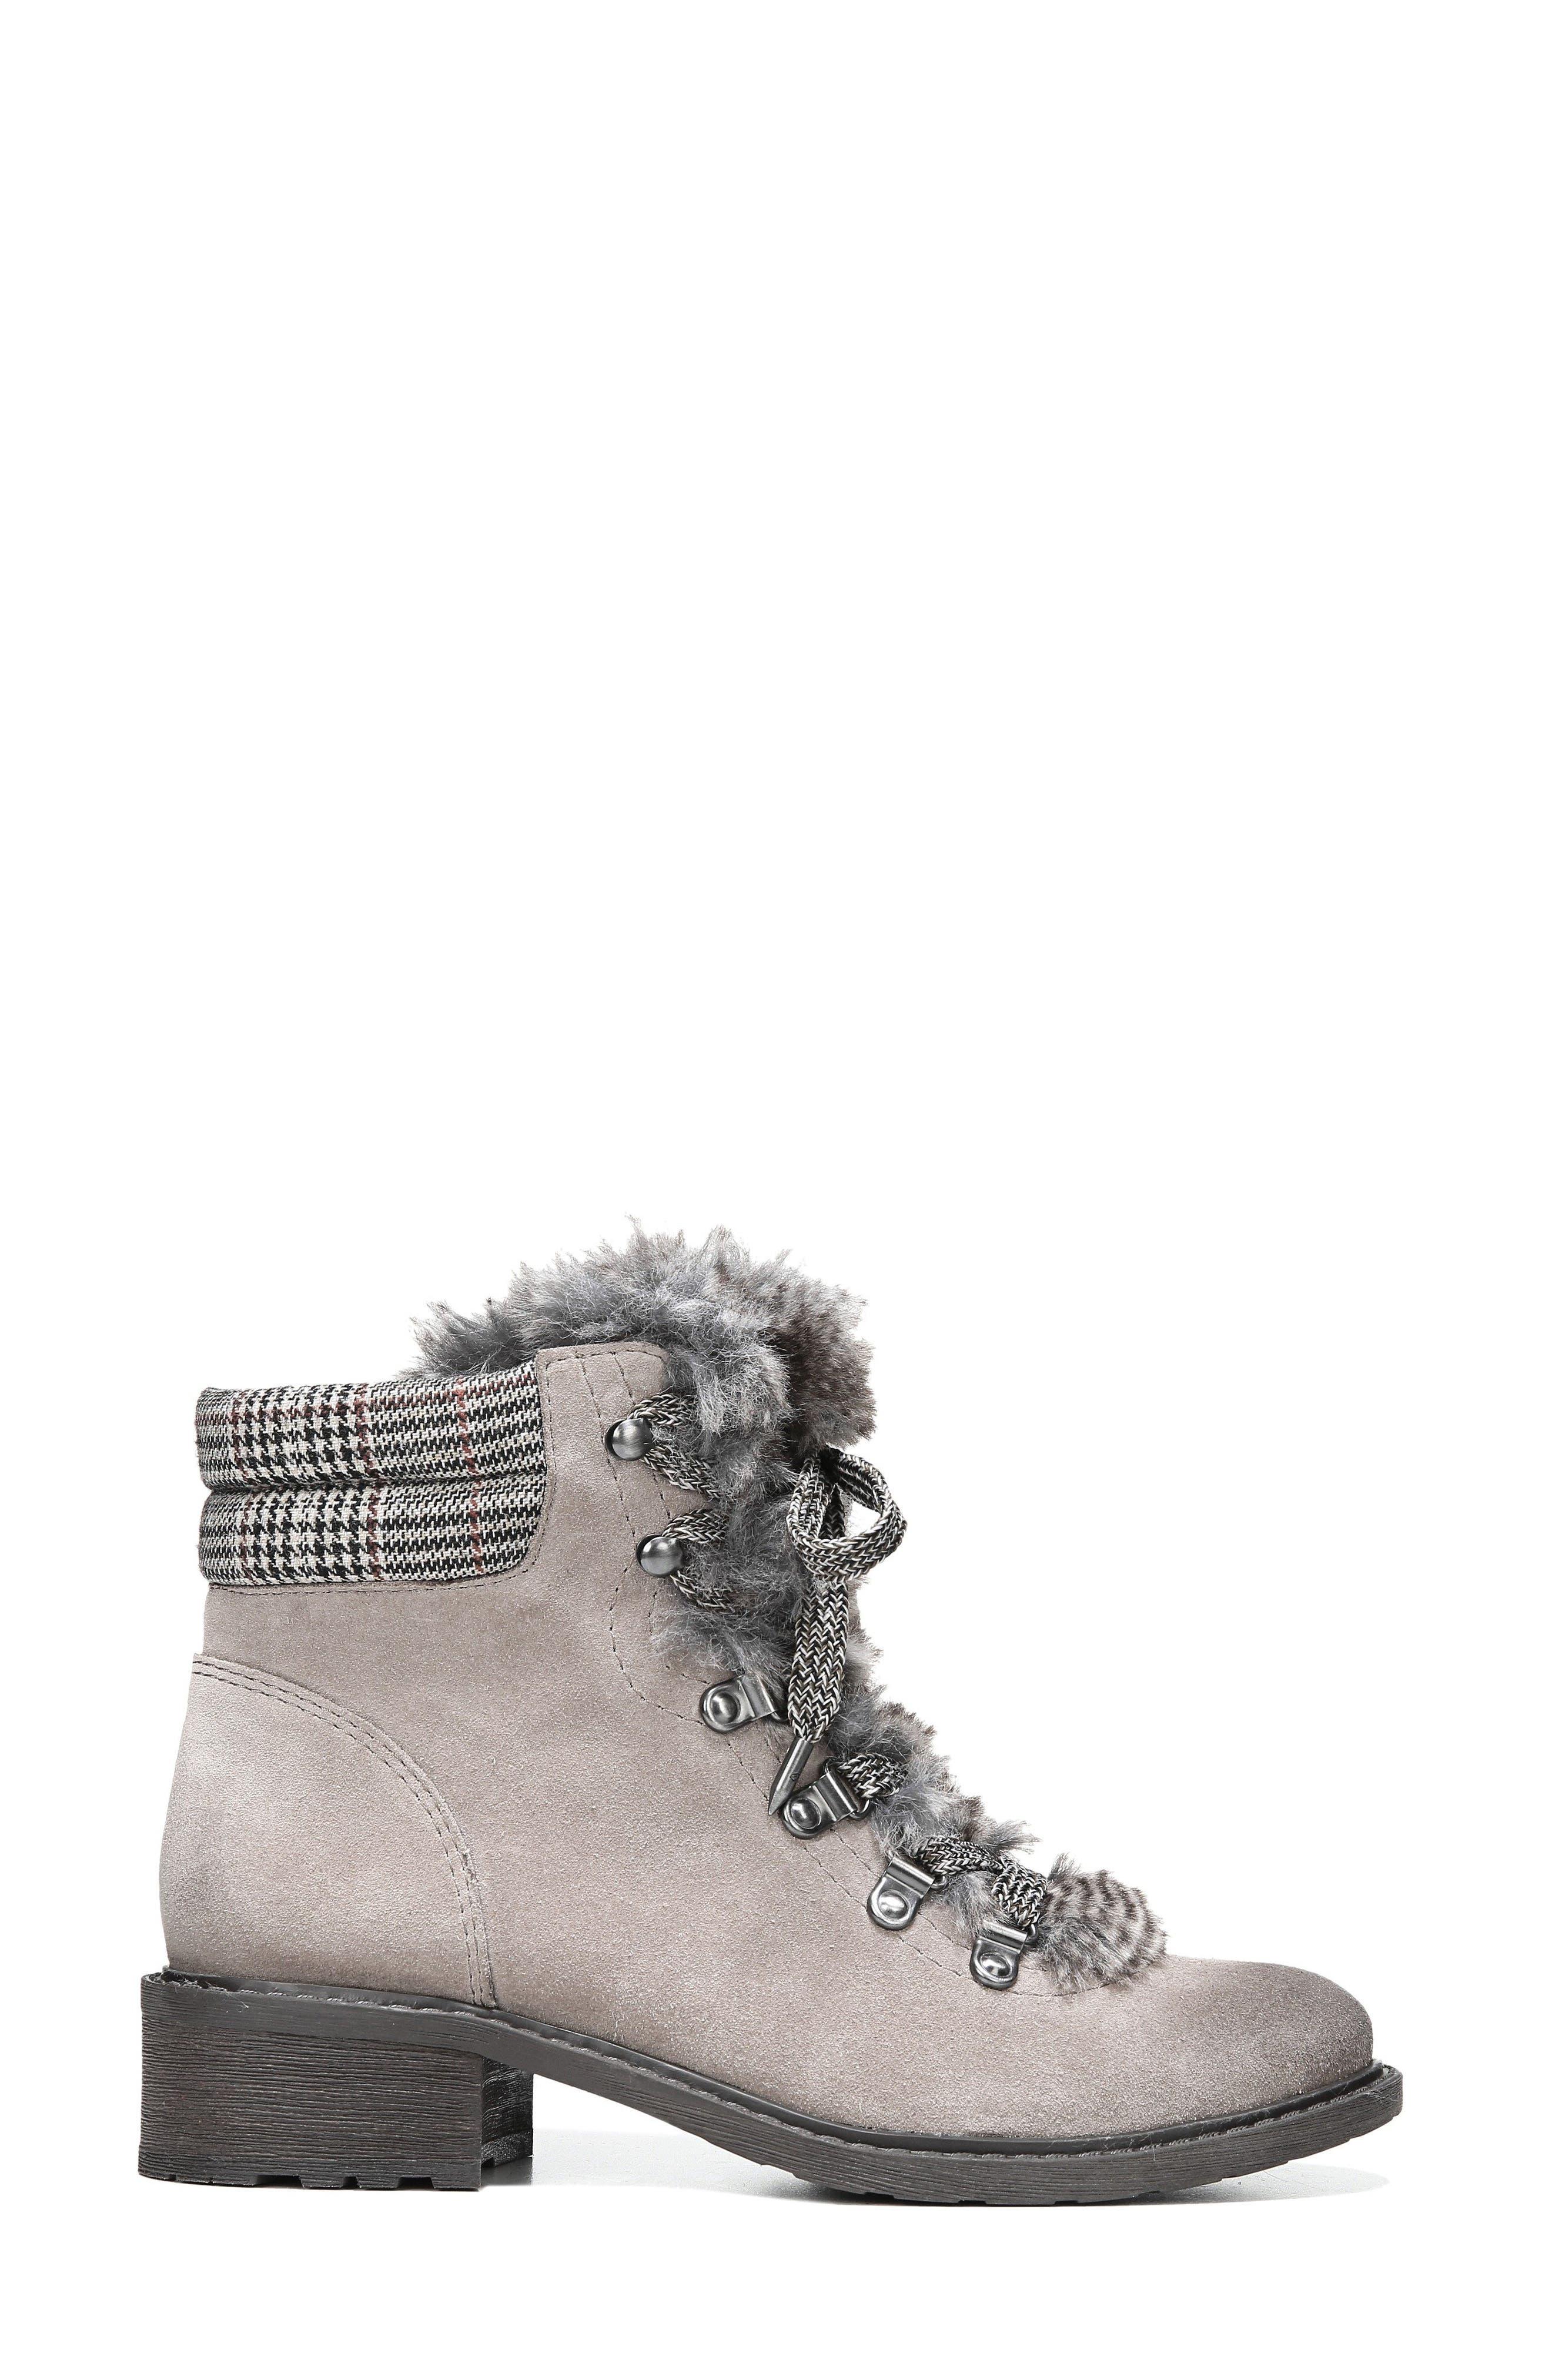 Darrah 2 Faux Fur Trim Boot,                             Alternate thumbnail 3, color,                             Grey Multi Suede